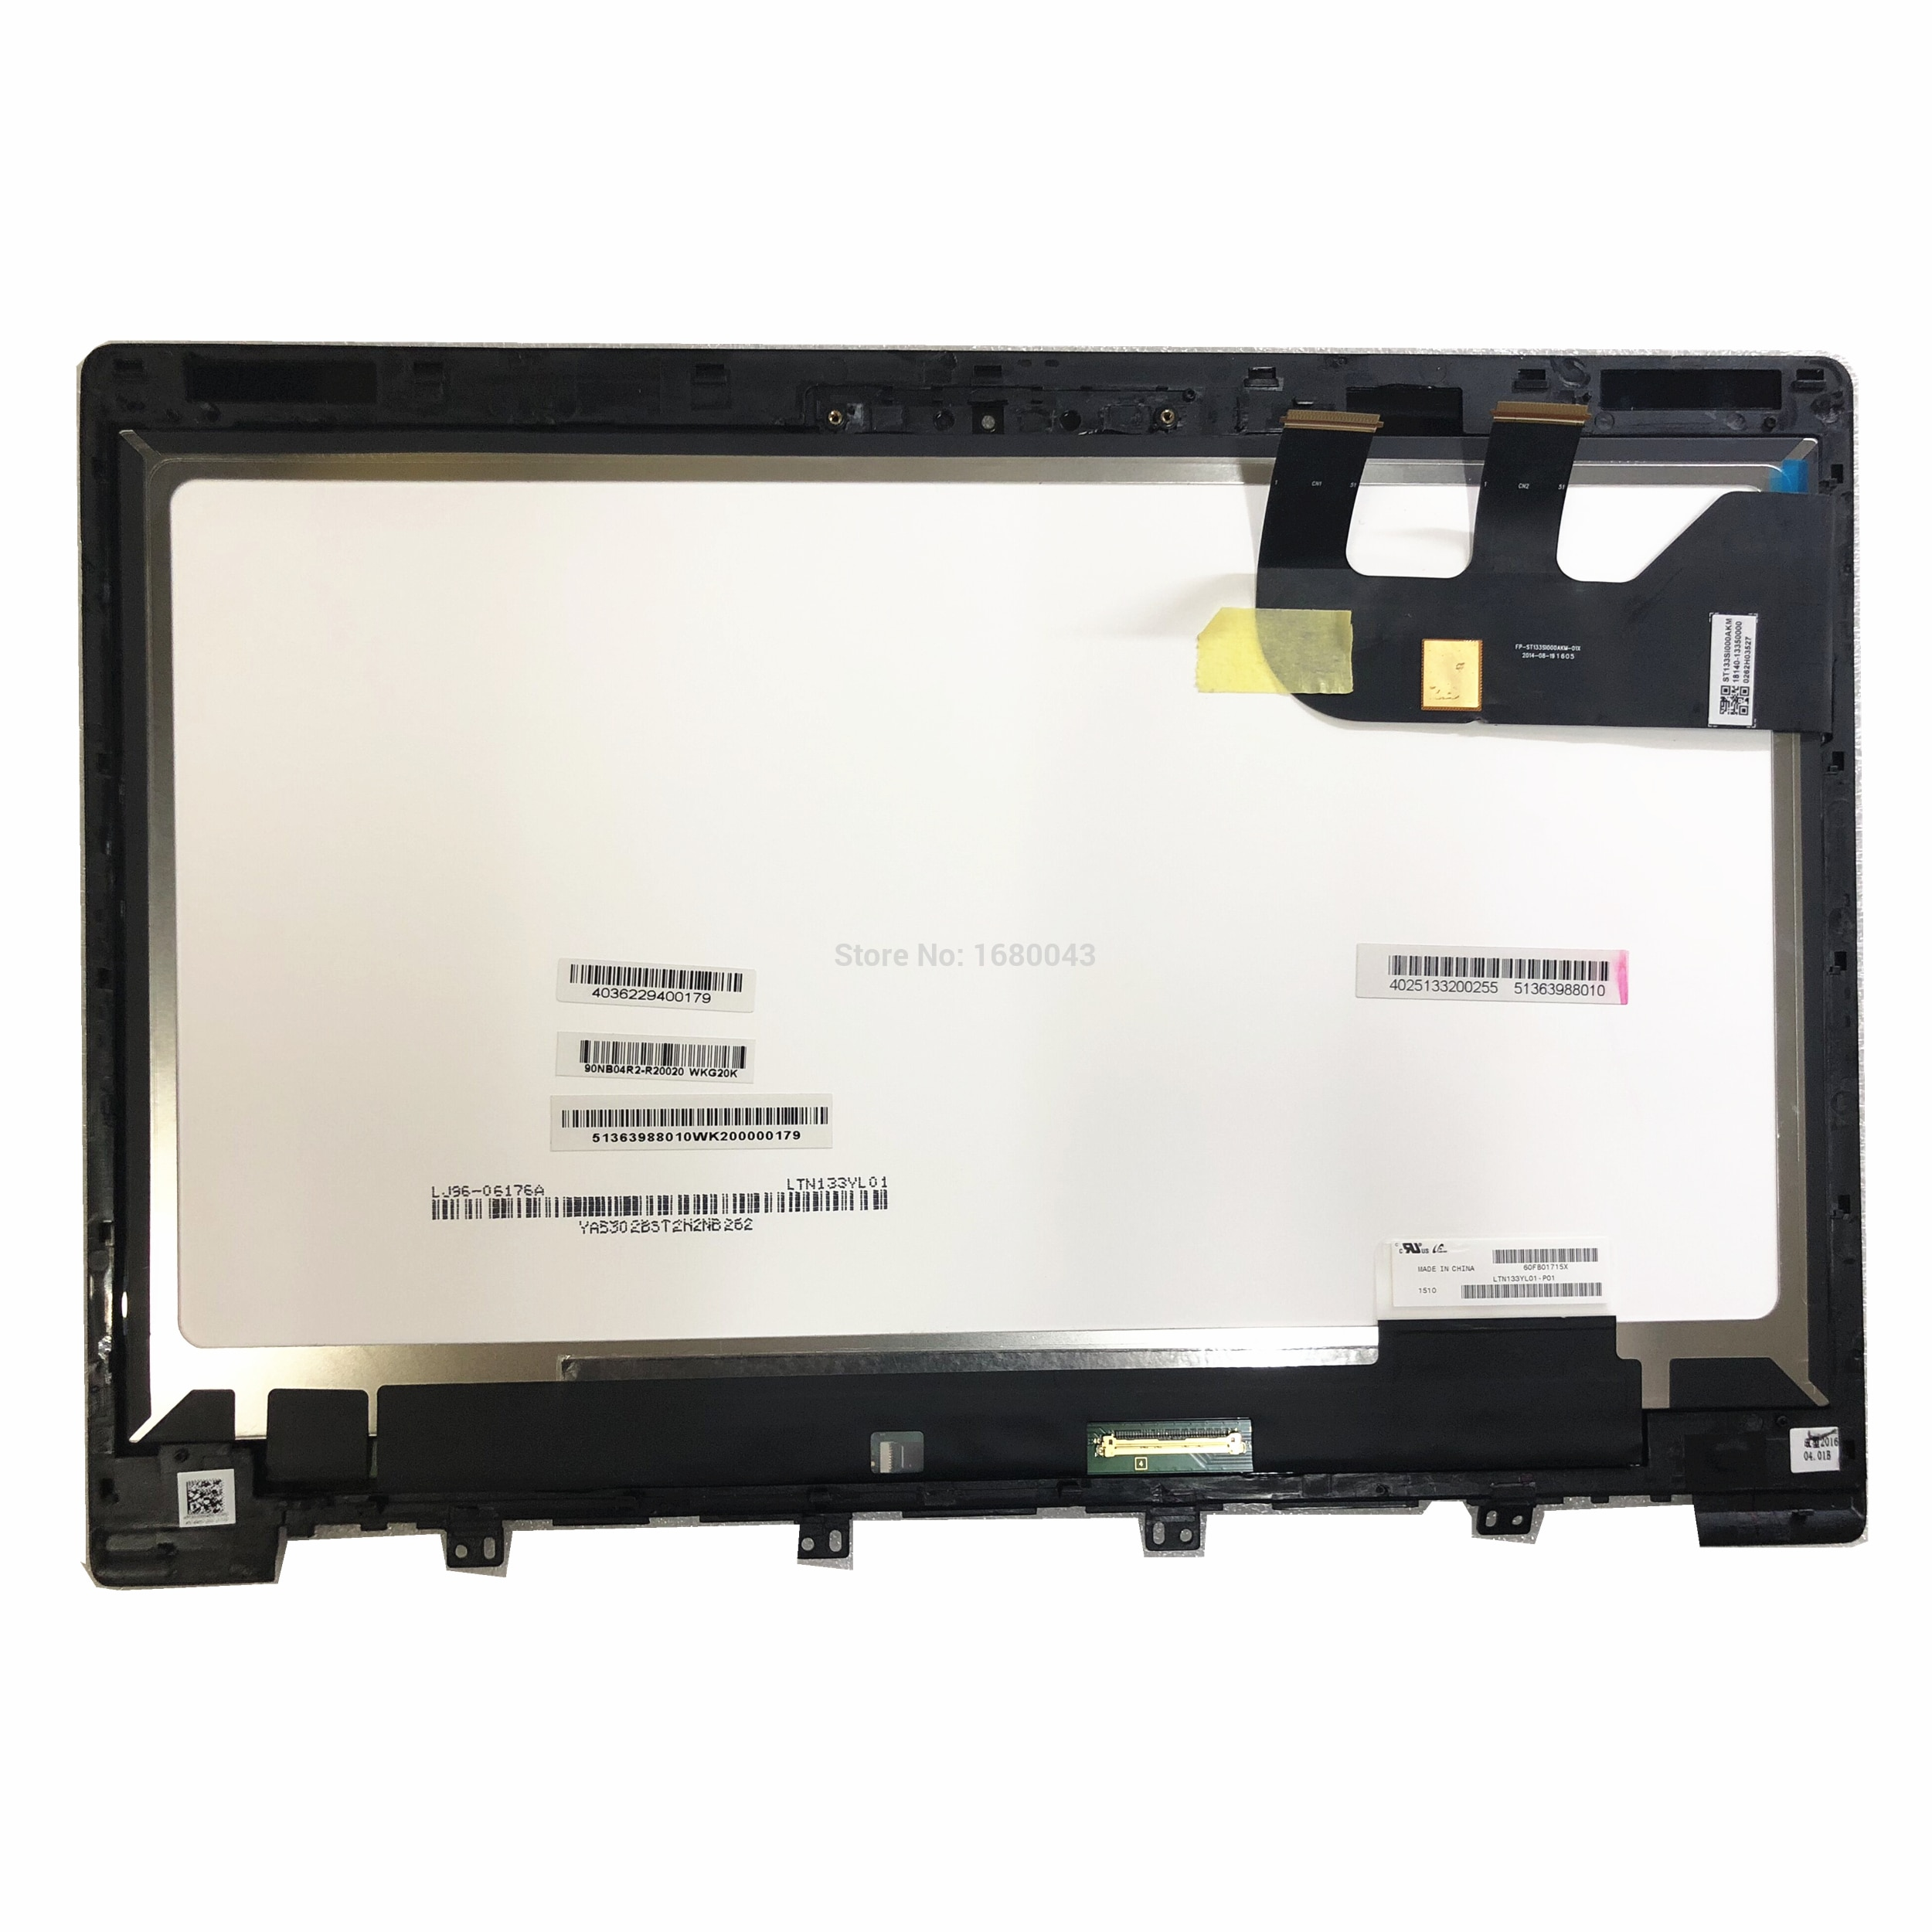 LTN133YL01 P01 pantalla LCD digitalizador montaje marco FP-ST133SI000AKM-01X para Asus Zenbook UX303LN...